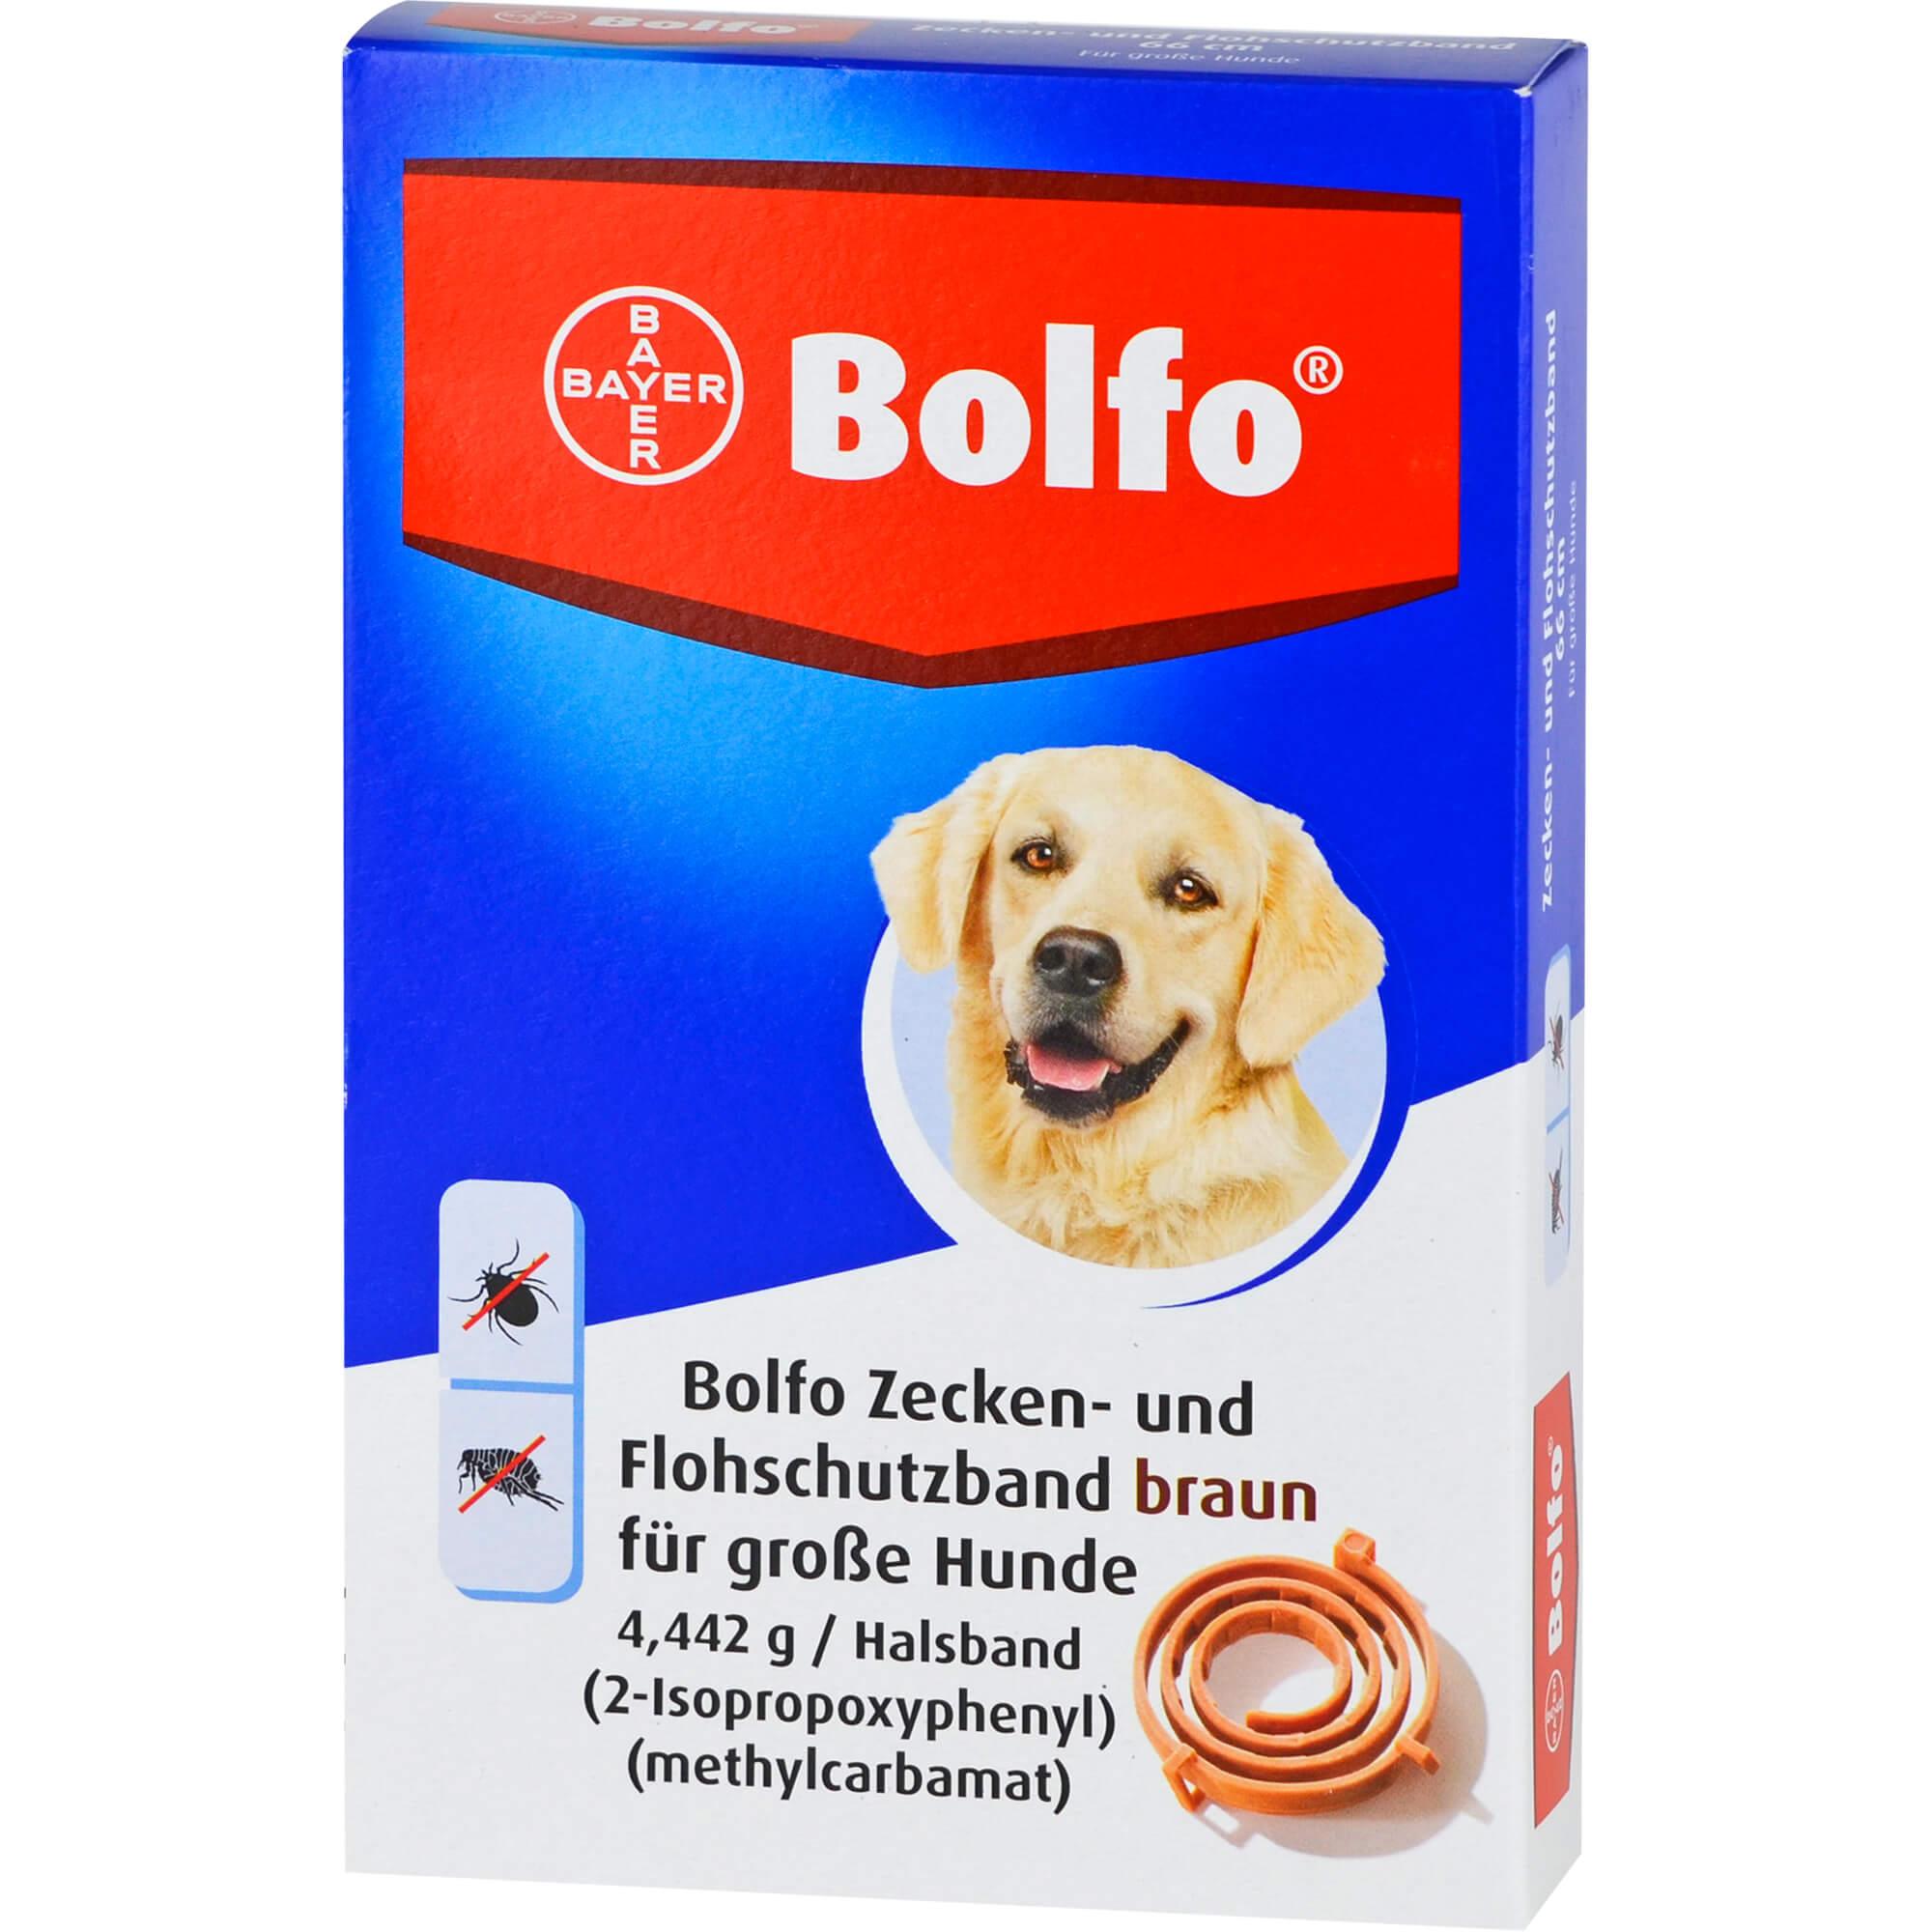 BOLFO Flohschutzband braun f.große Hunde